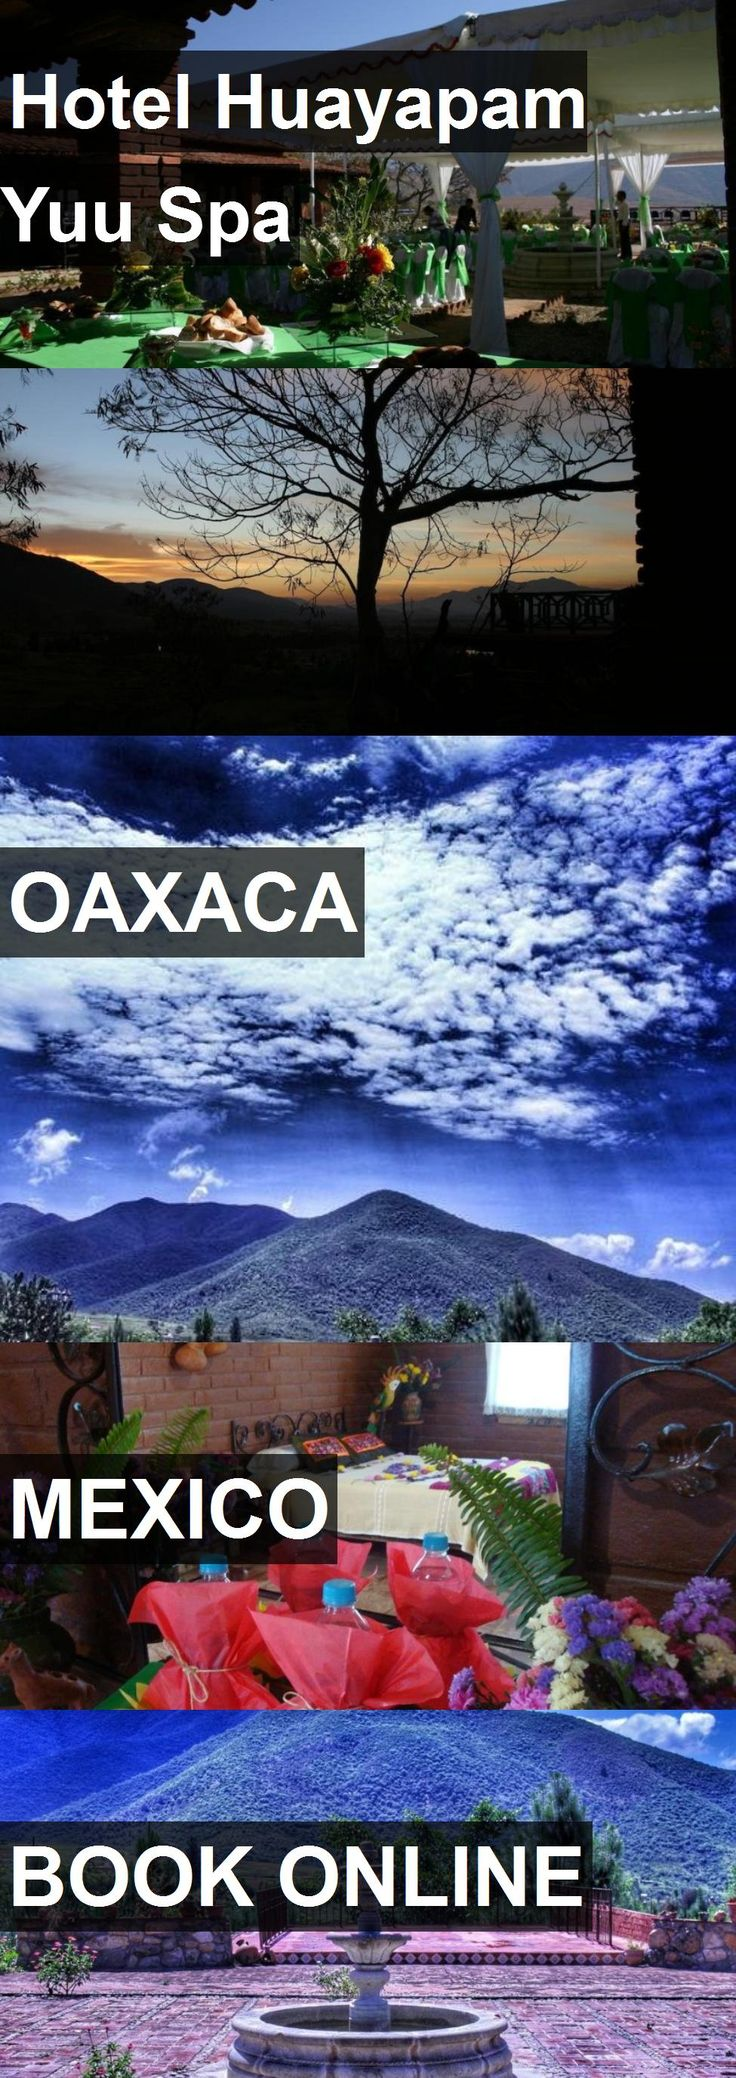 Hotel Hotel Huayapam Yuu Spa in Oaxaca, Mexico. For more information, photos, reviews and best prices please follow the link. #Mexico #Oaxaca #HotelHuayapamYuuSpa #hotel #travel #vacation